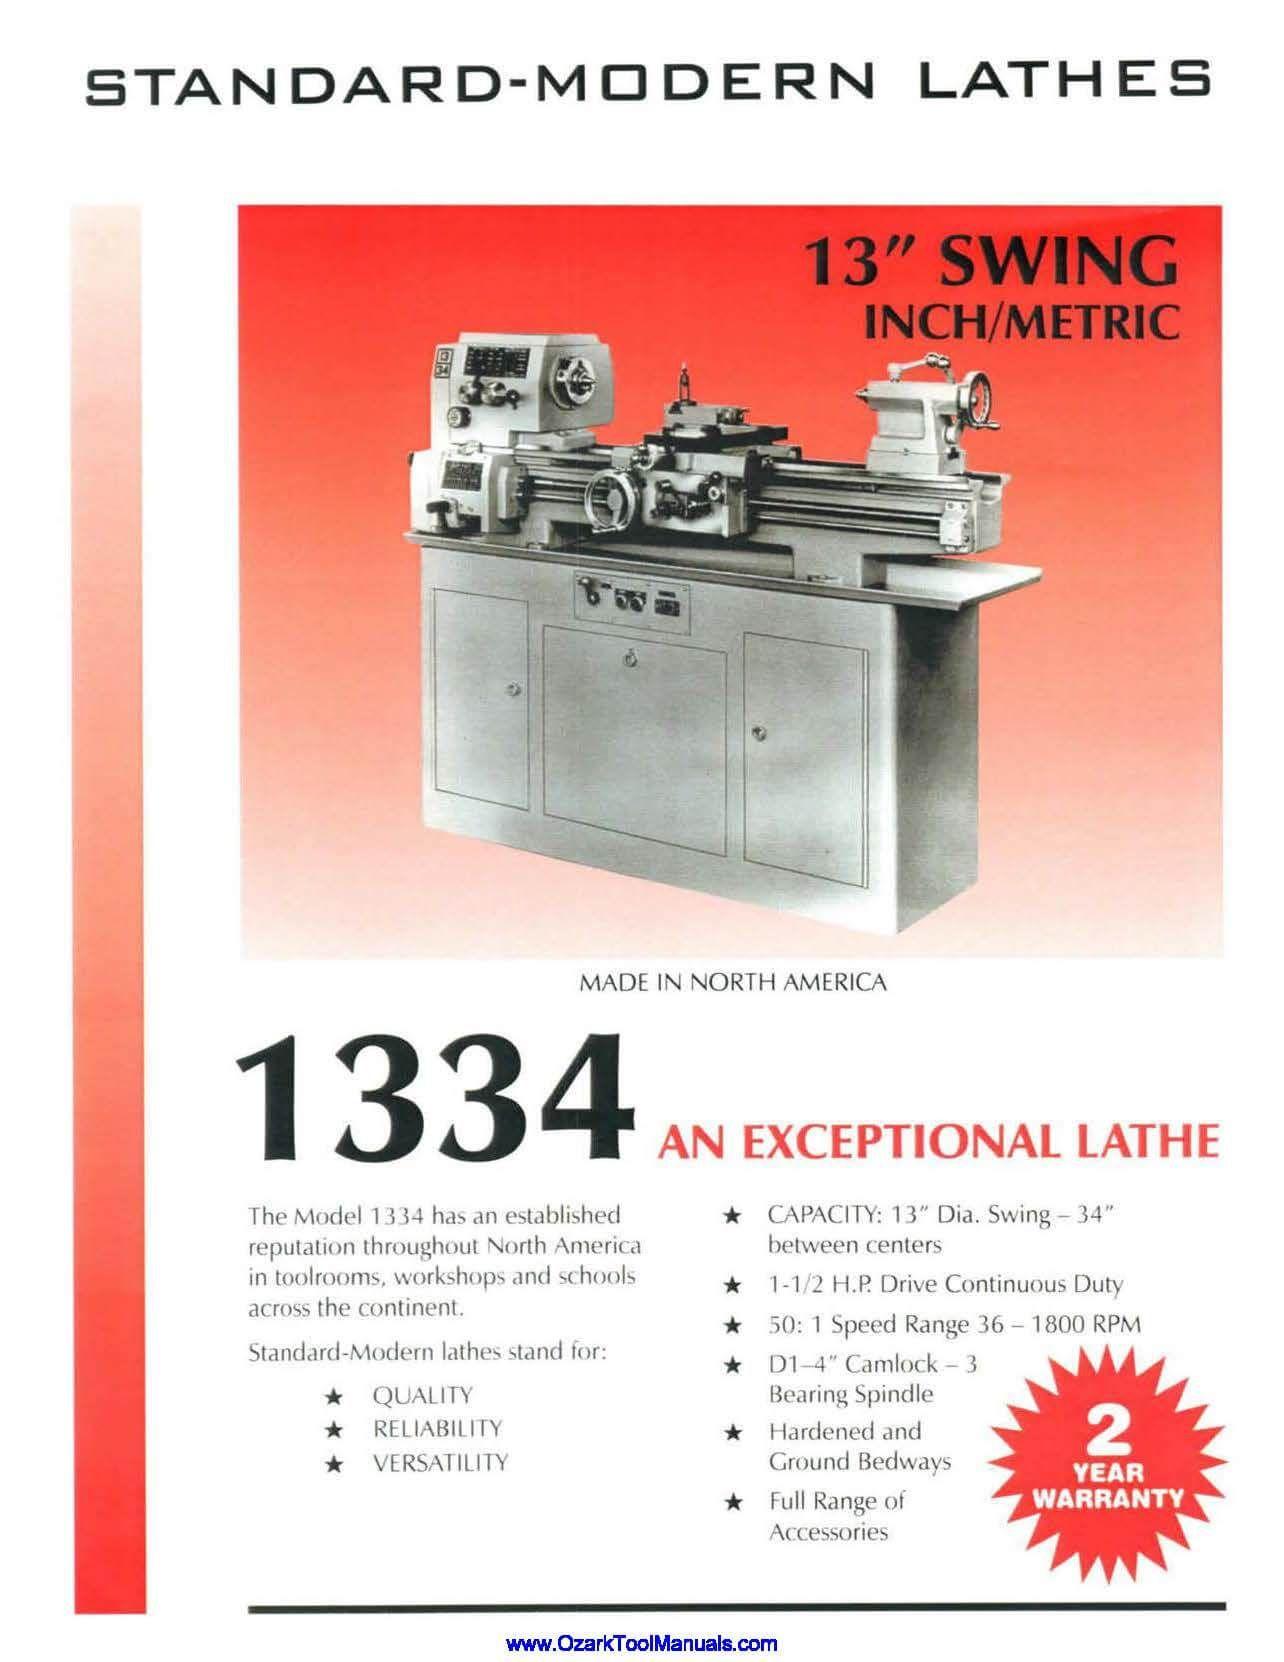 New Free Pdf Downloads Of Machinery Tool Catalogs Bulletins Ozark Tool Manuals Books Ozark Woodworking Machinery Machinery